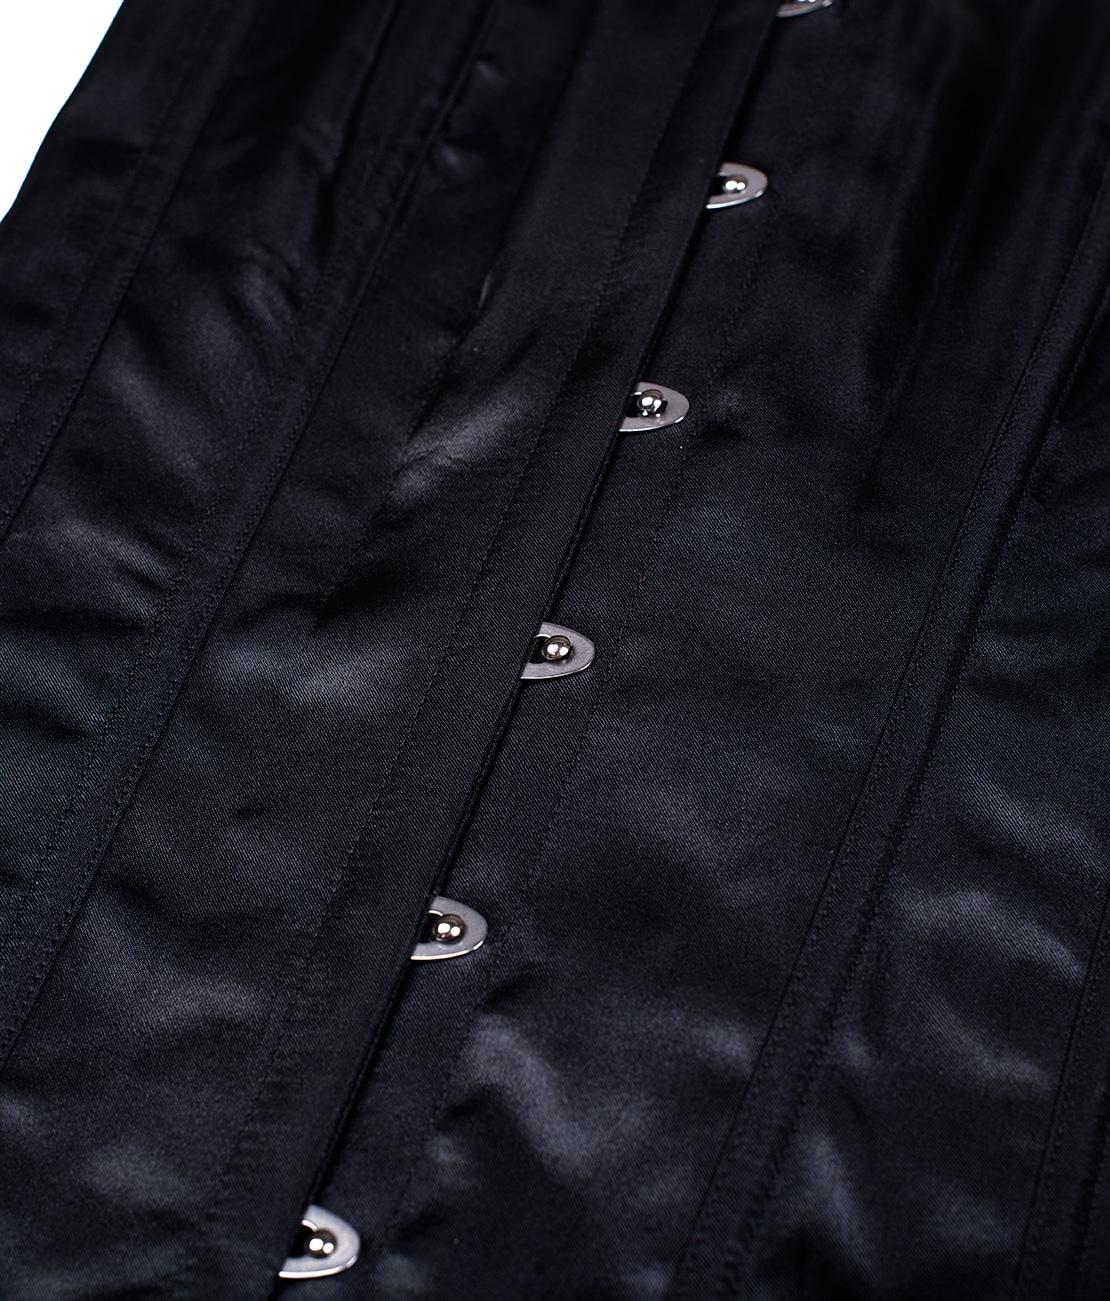 Corset Satiné packshot Detail 2